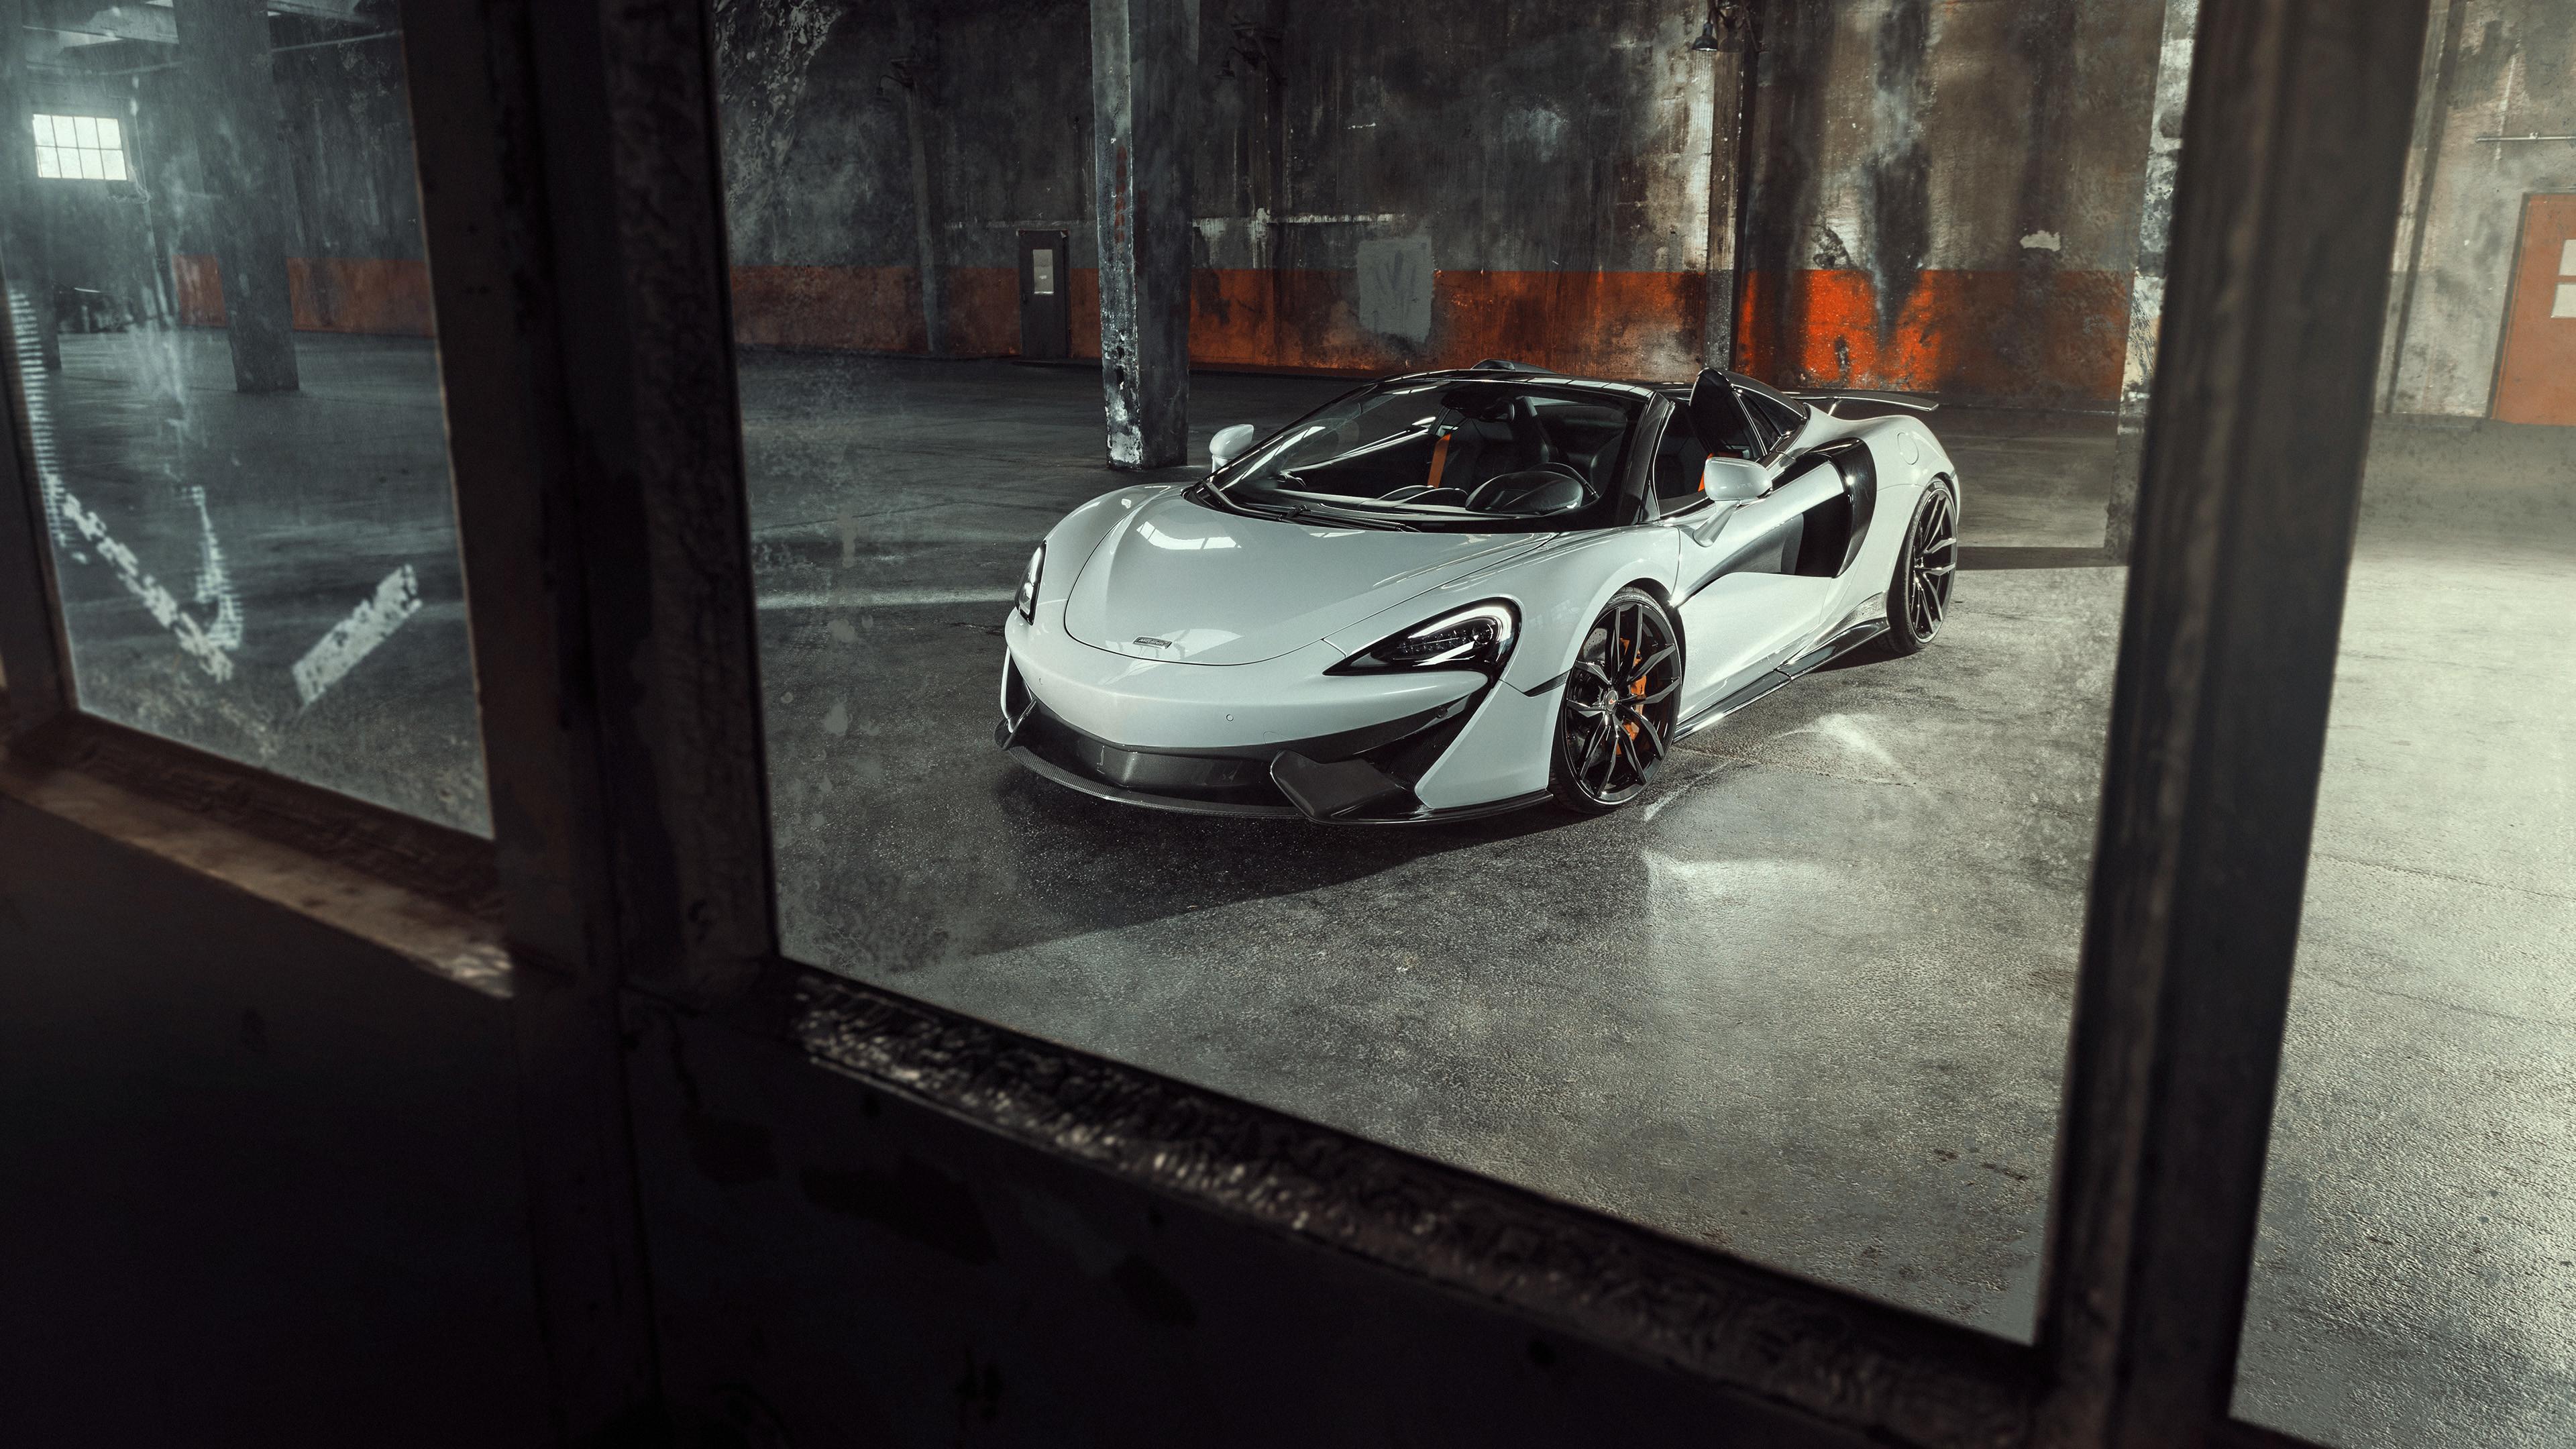 4k mclaren 570s spider 1539111830 - 4k McLaren 570s Spider - mclaren wallpapers, mclaren 570s spider wallpapers, hd-wallpapers, cars wallpapers, 4k-wallpapers, 2018 cars wallpapers